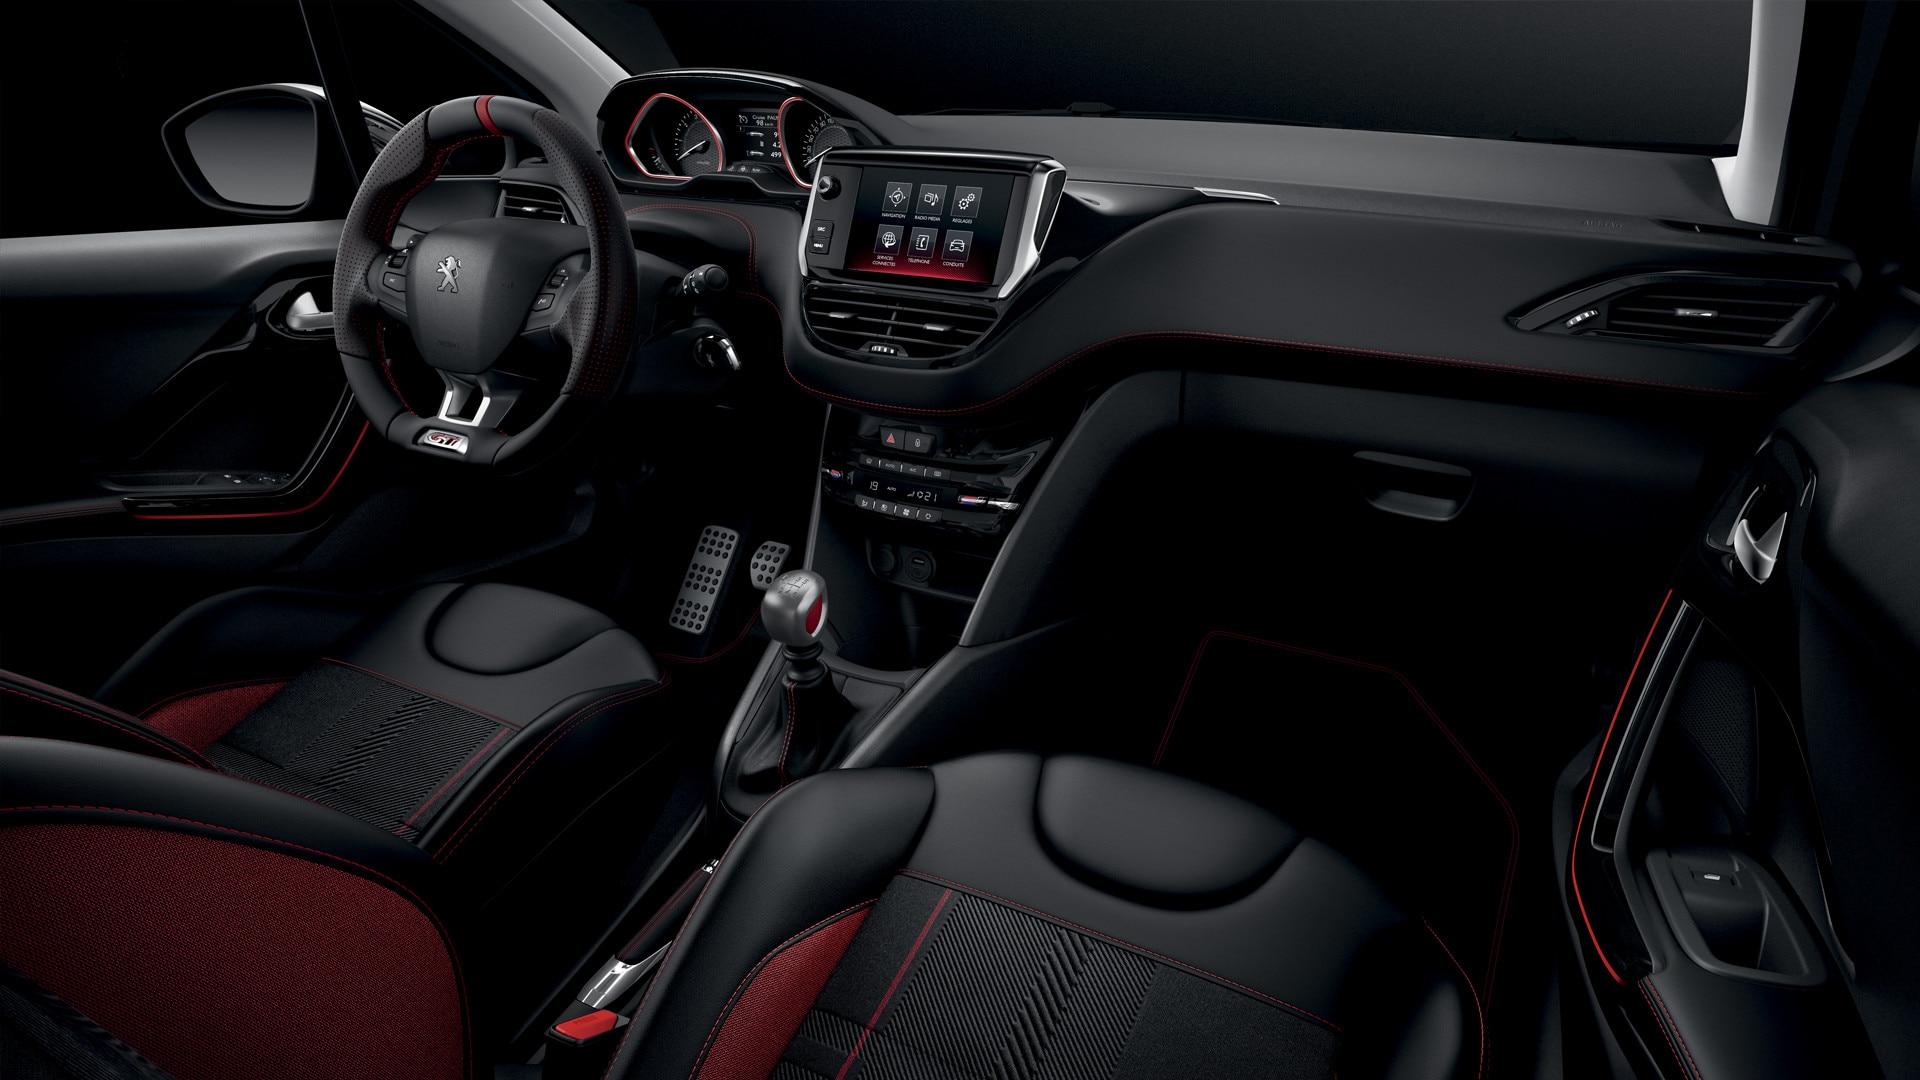 peugeot 208 gti new car showroom | hot hatch sports car | test drive